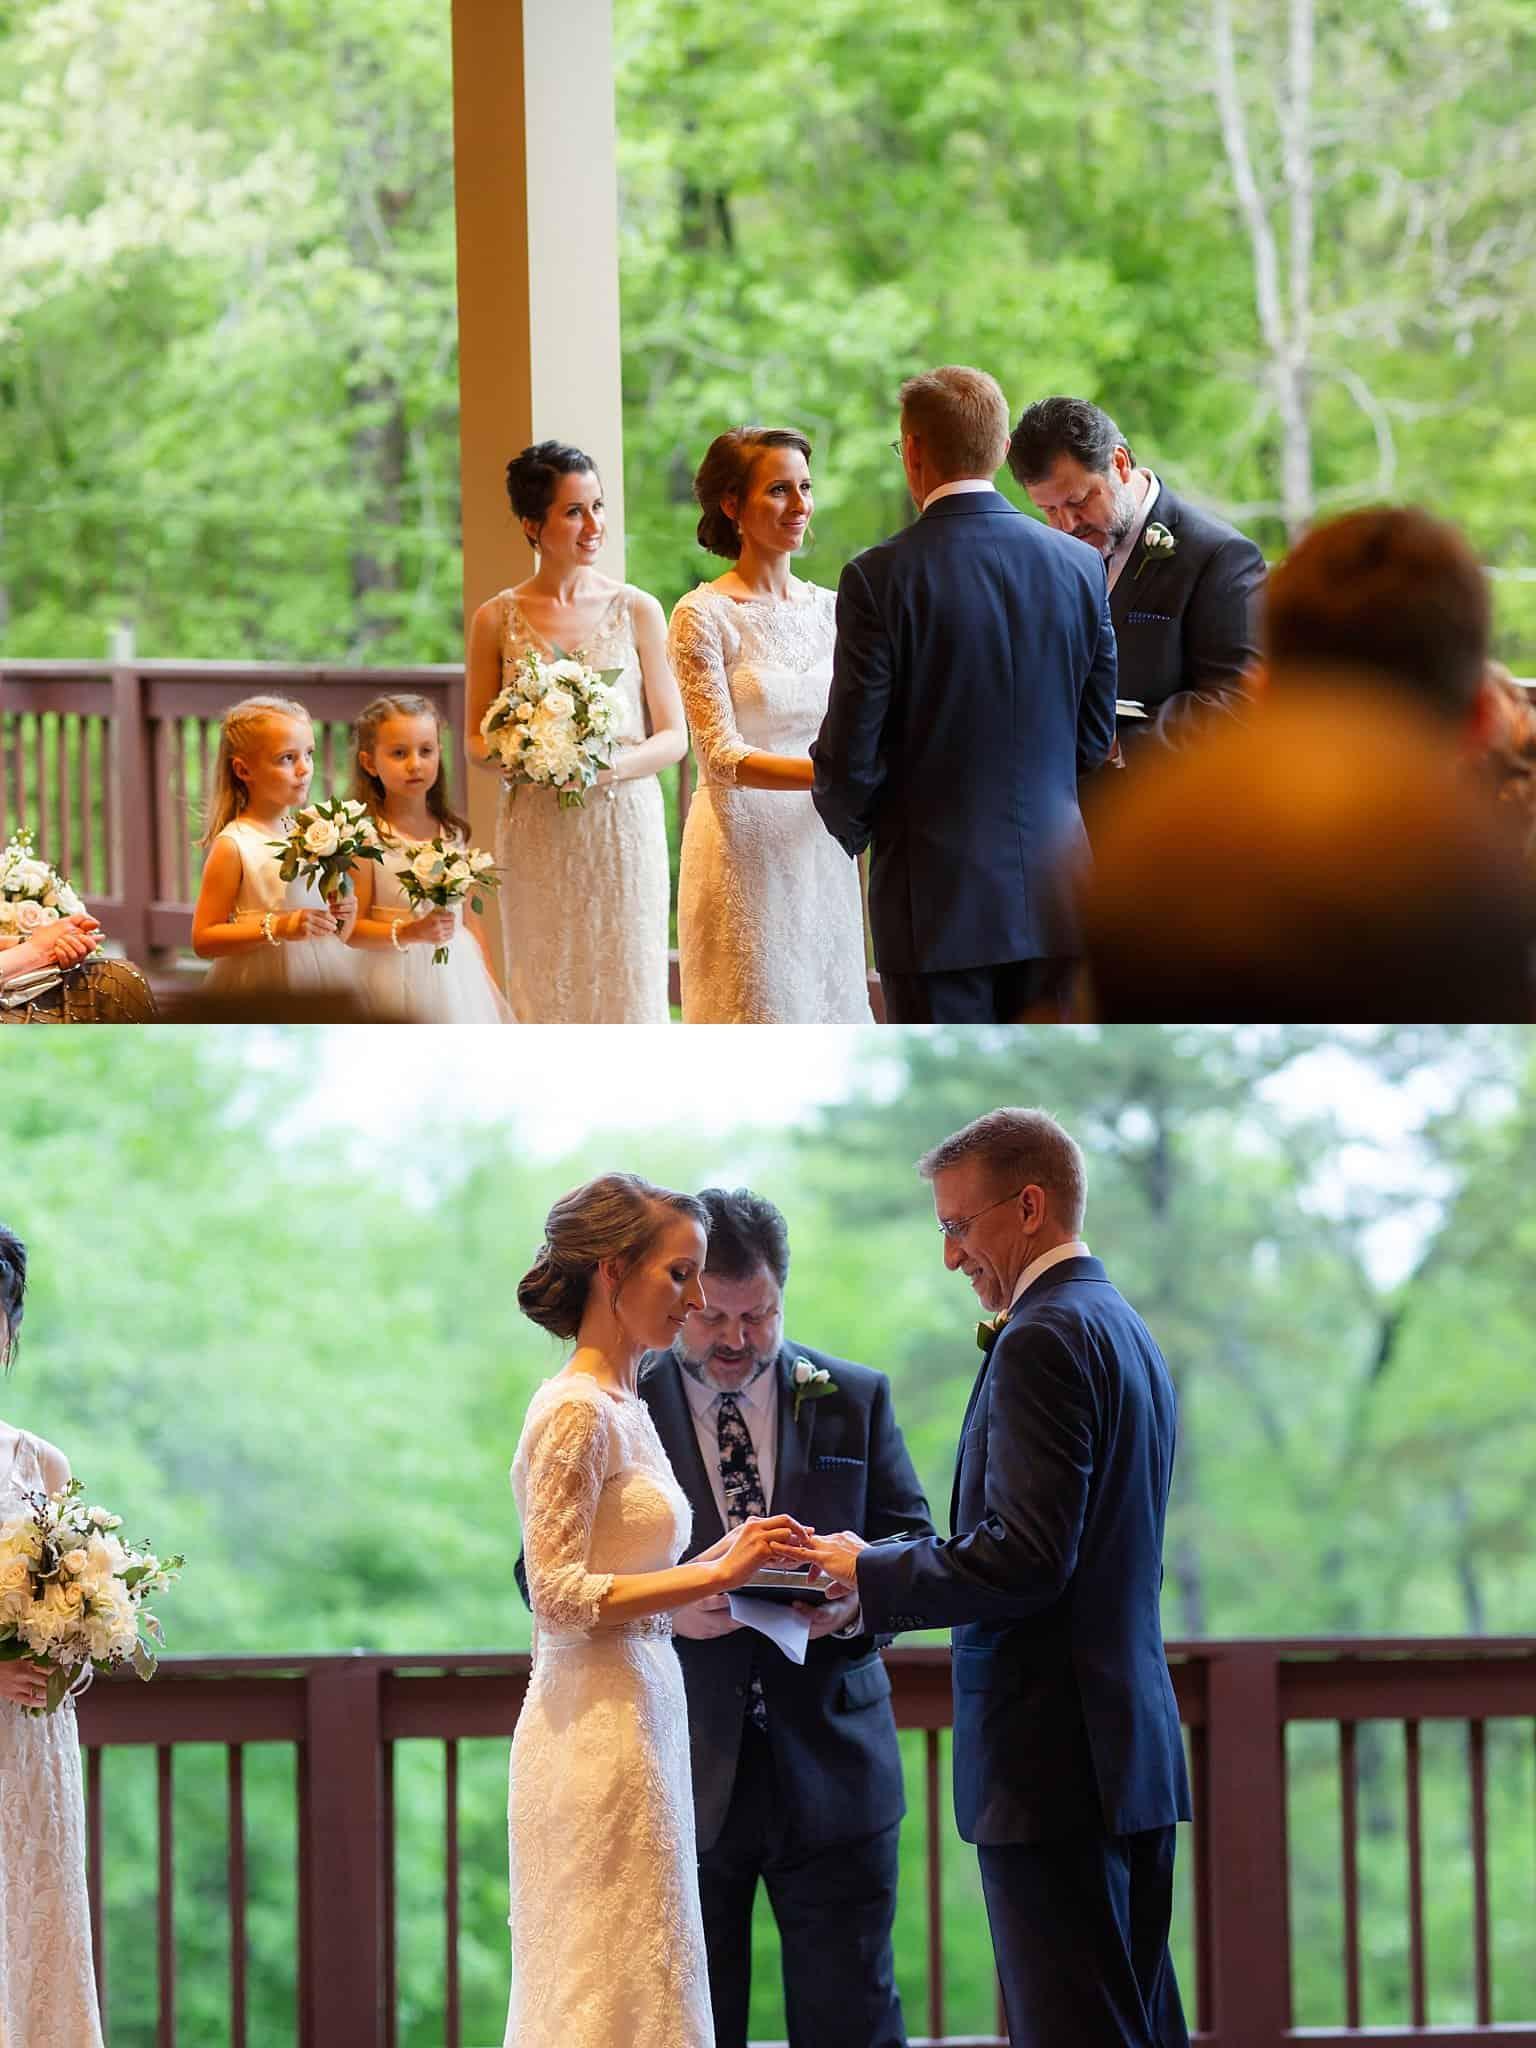 April Wedding on the Deck